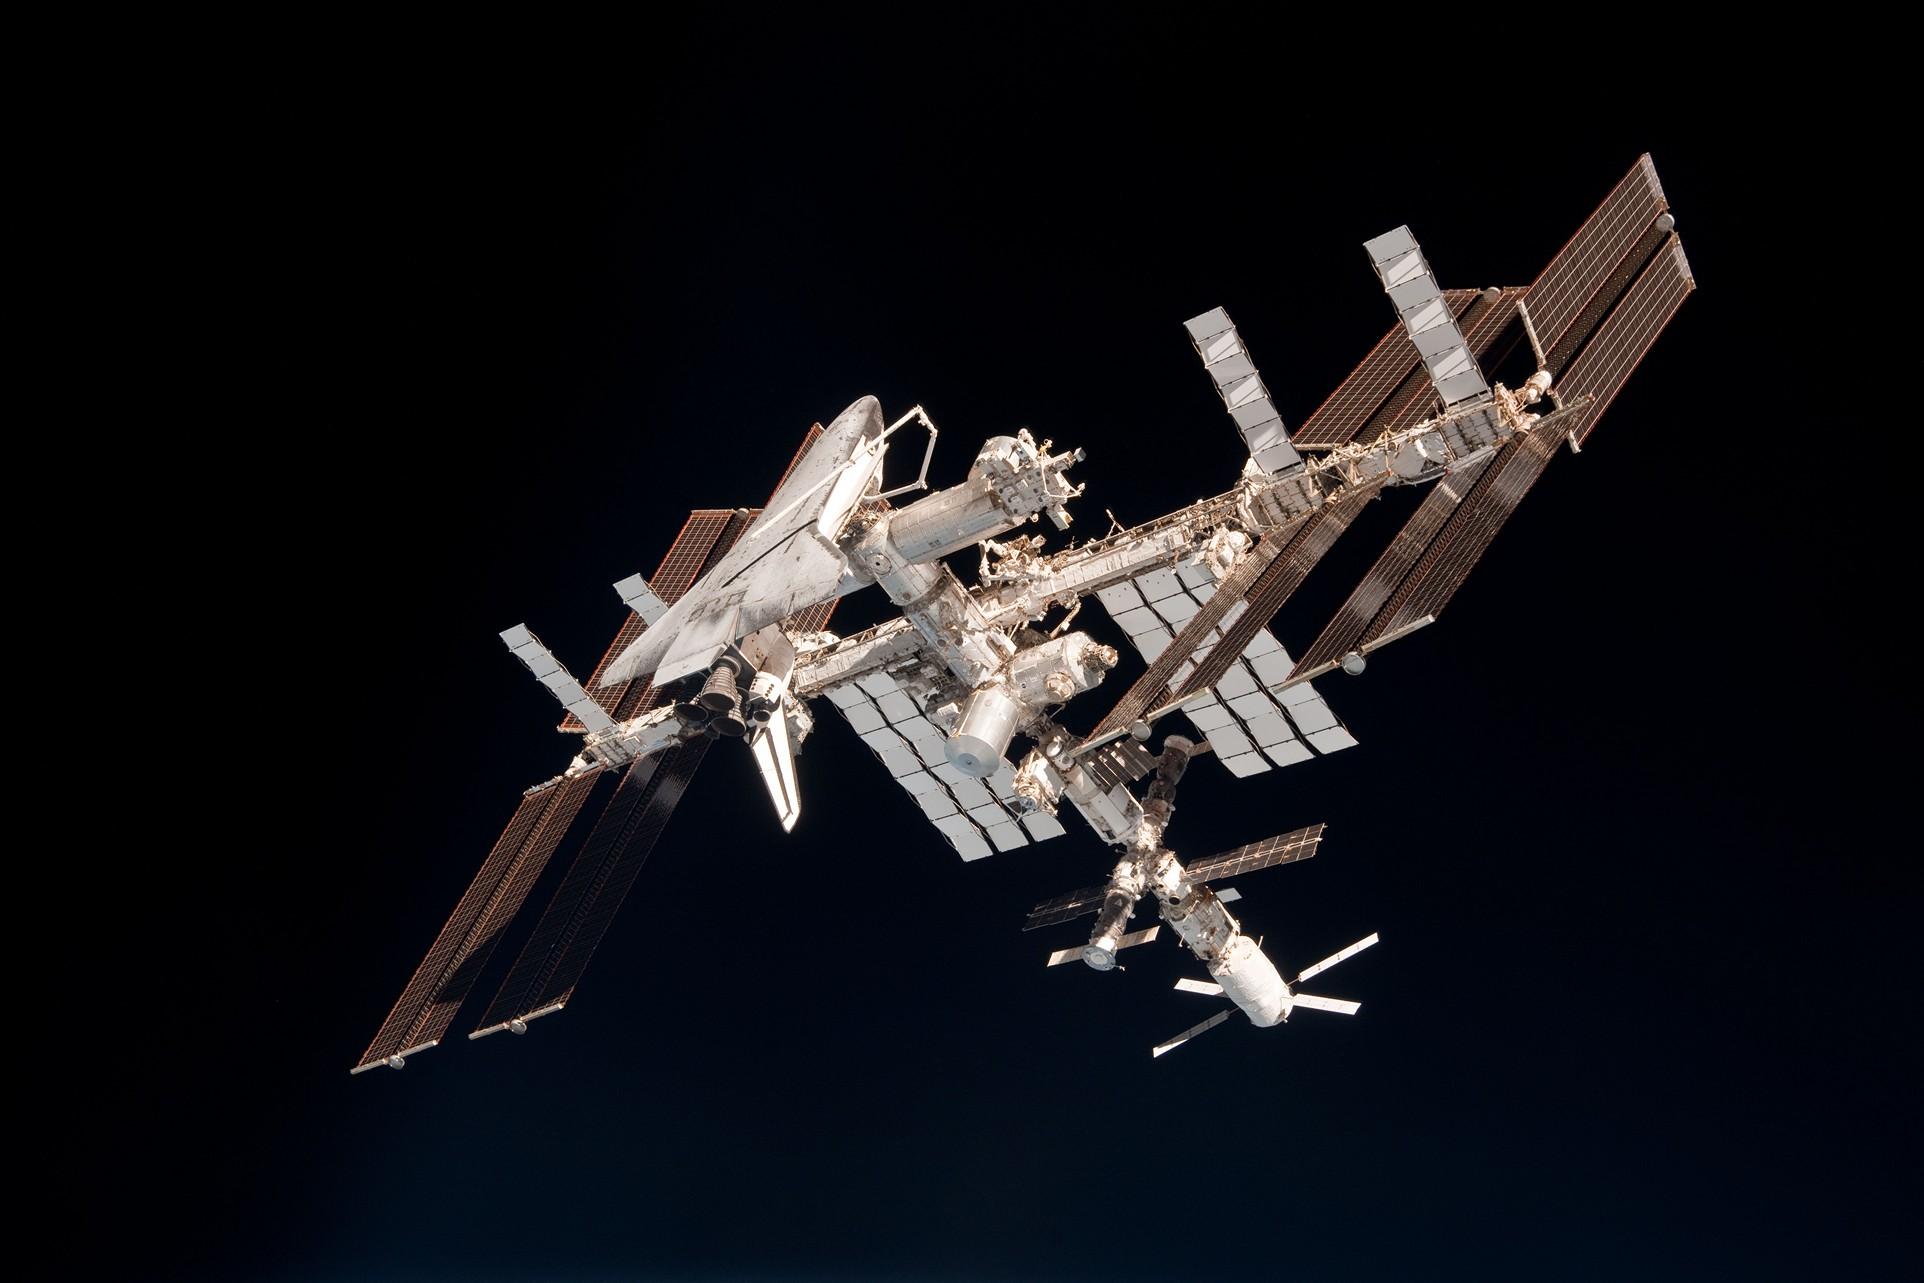 sm-navette-spatiale-iss-station-spatiale-01.jpg